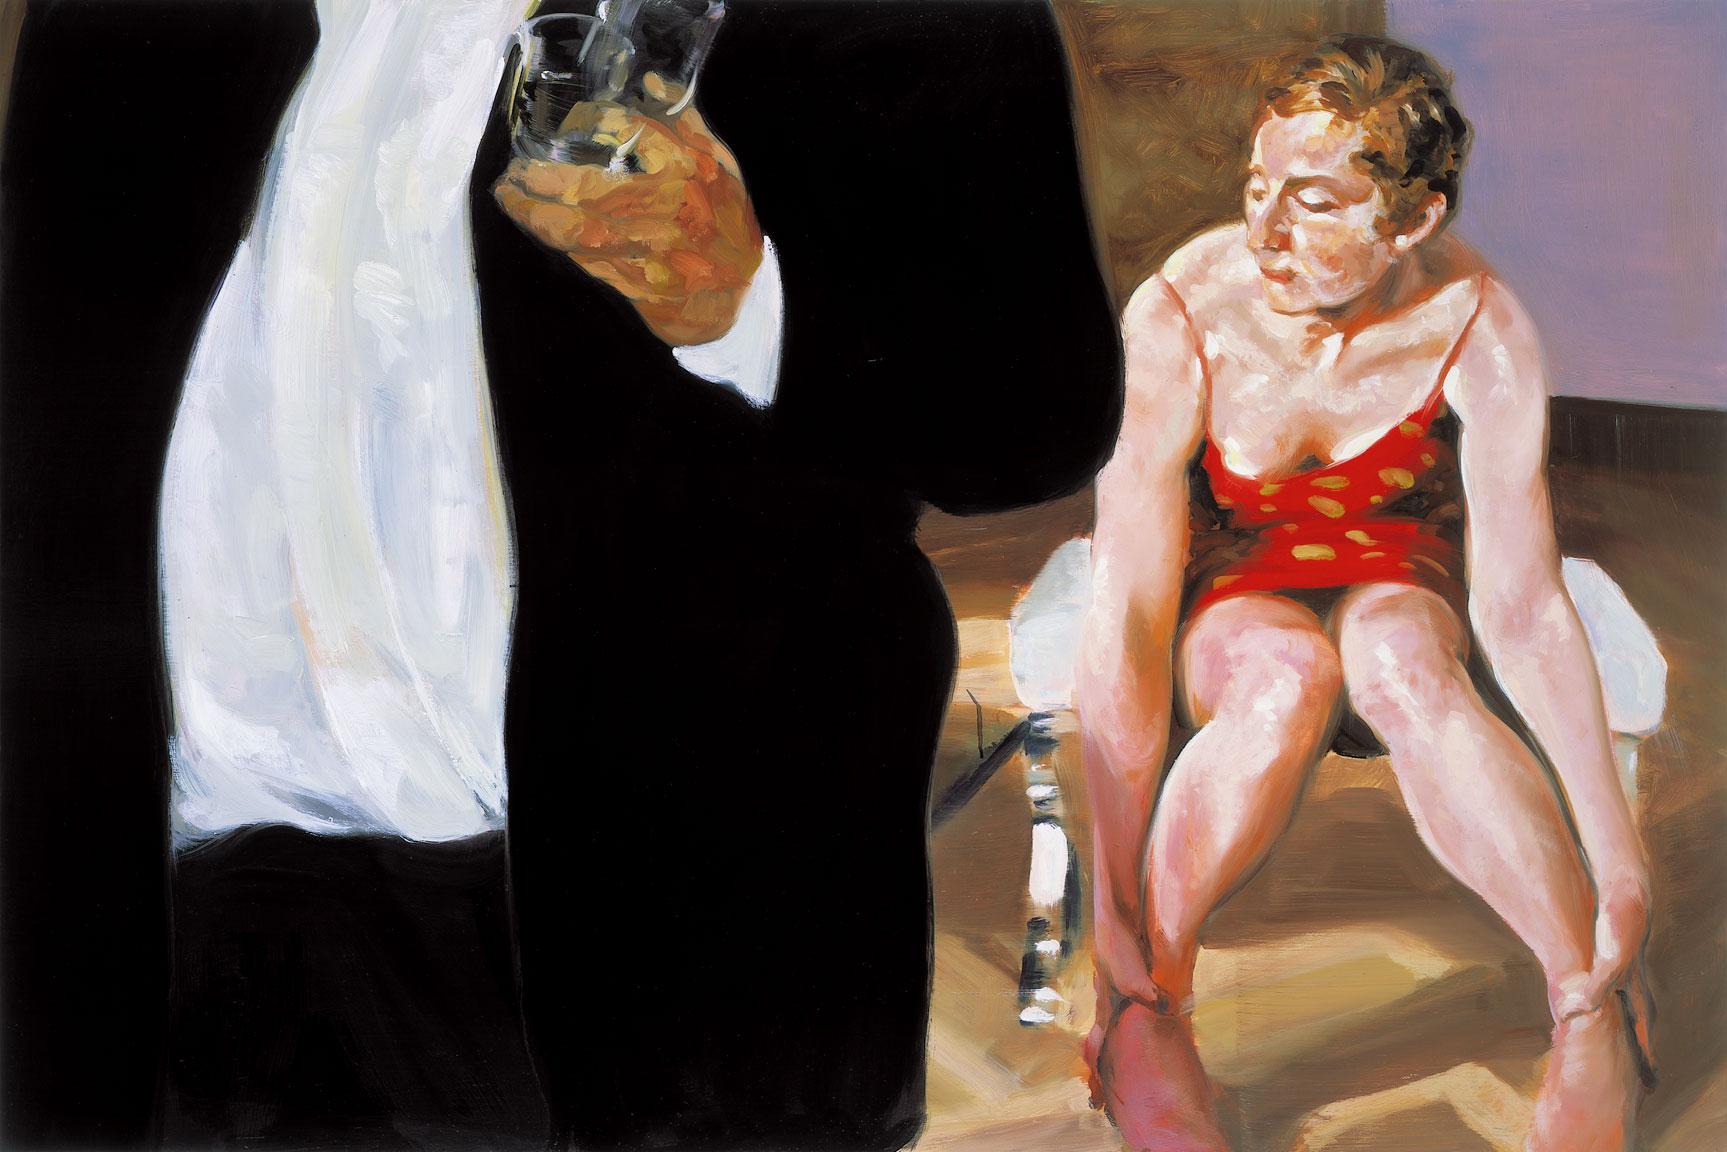 Krefeld Project; Sunroom, Scene #2, 2002. Oil on linen. 36 x 54 in. (91 x 137 cm)